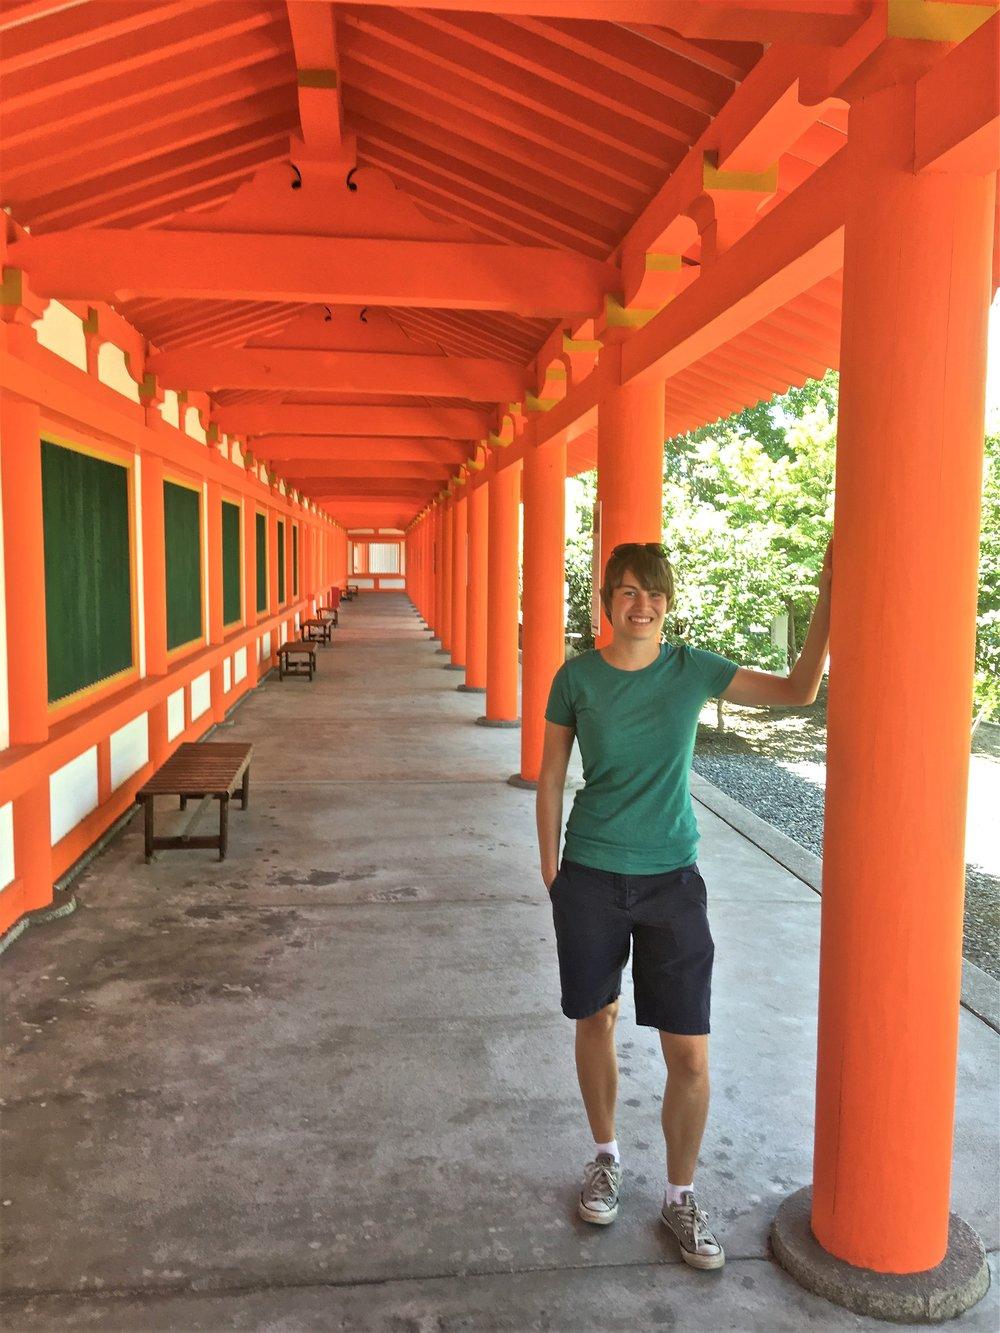 teri_Japan_Kyoto_SanjusangendoHall_spiritedtable_photo1.jpg